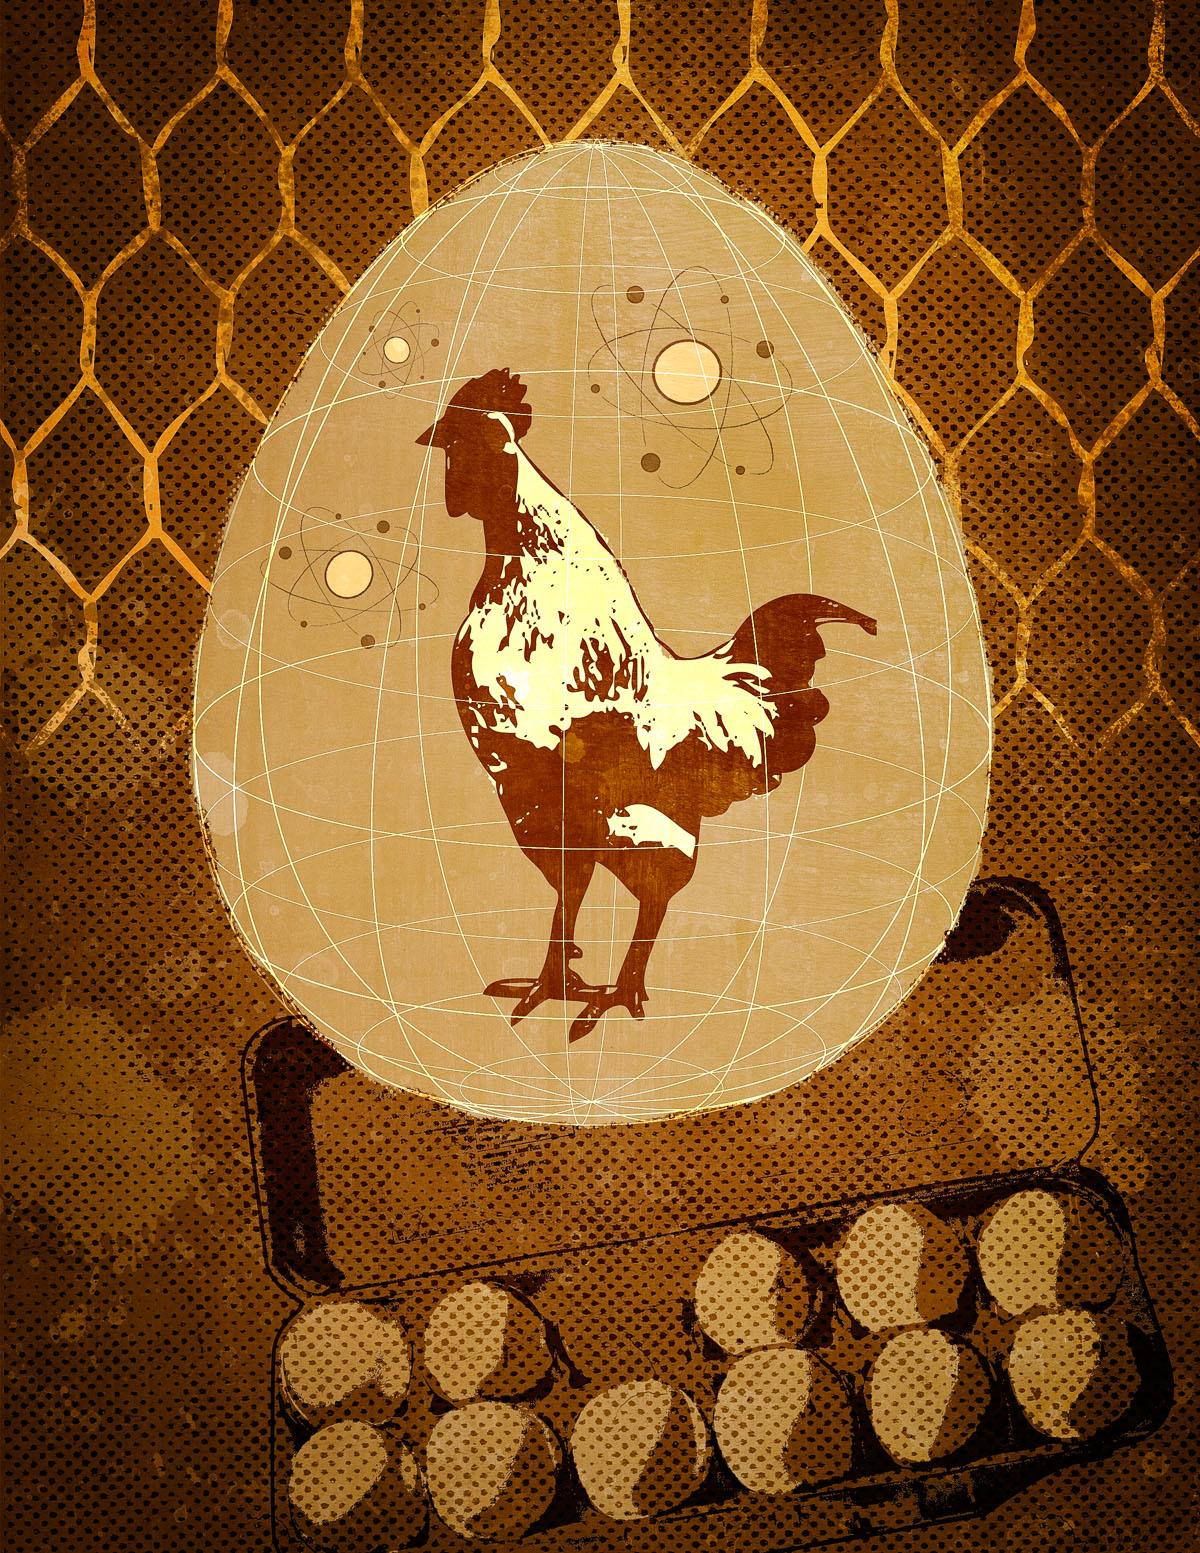 chicken-egg-2.jpg